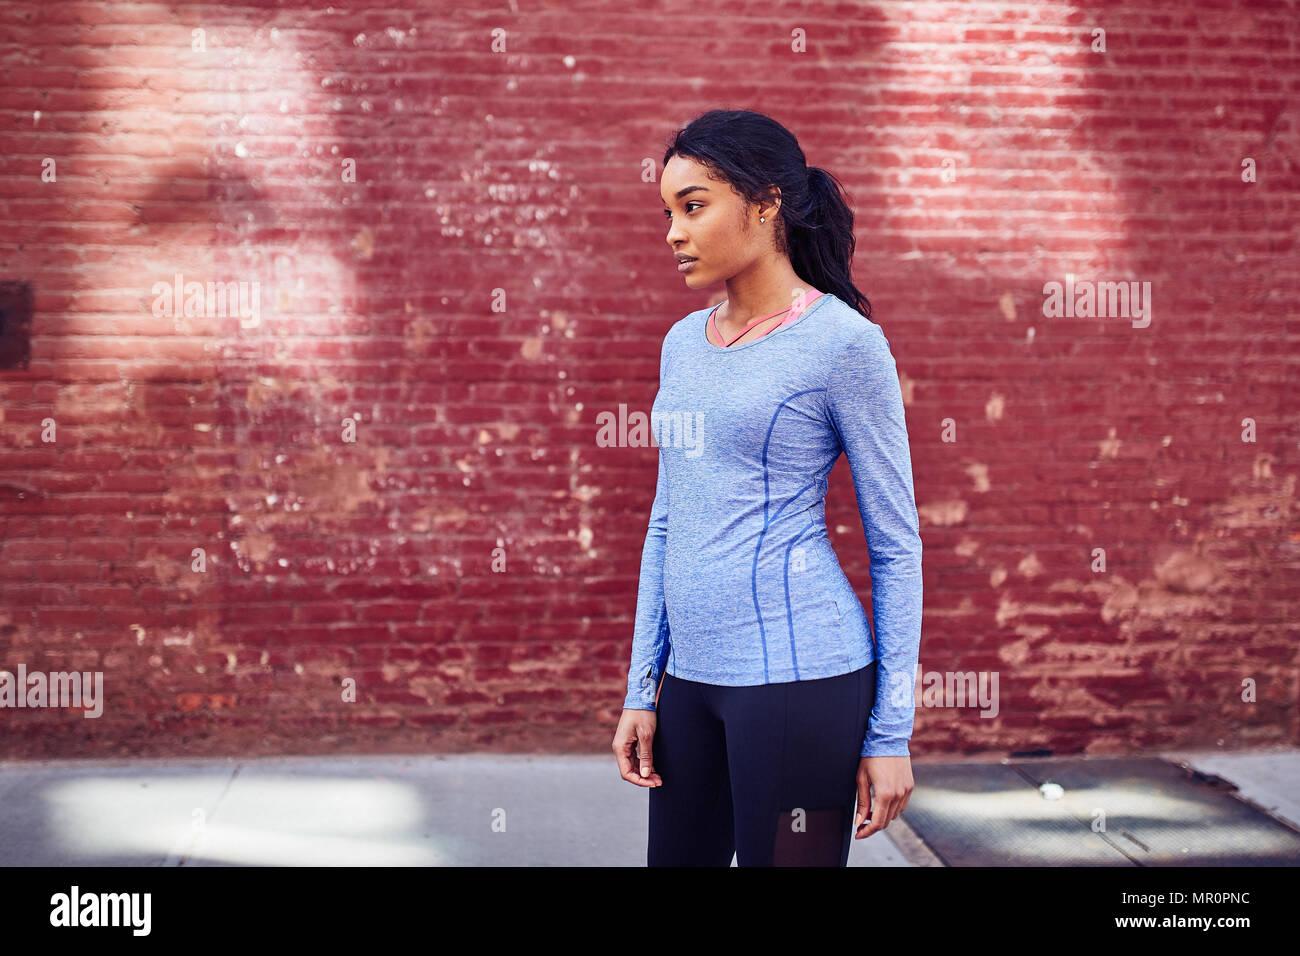 Mujer Negra descansa después de ejecutar Imagen De Stock